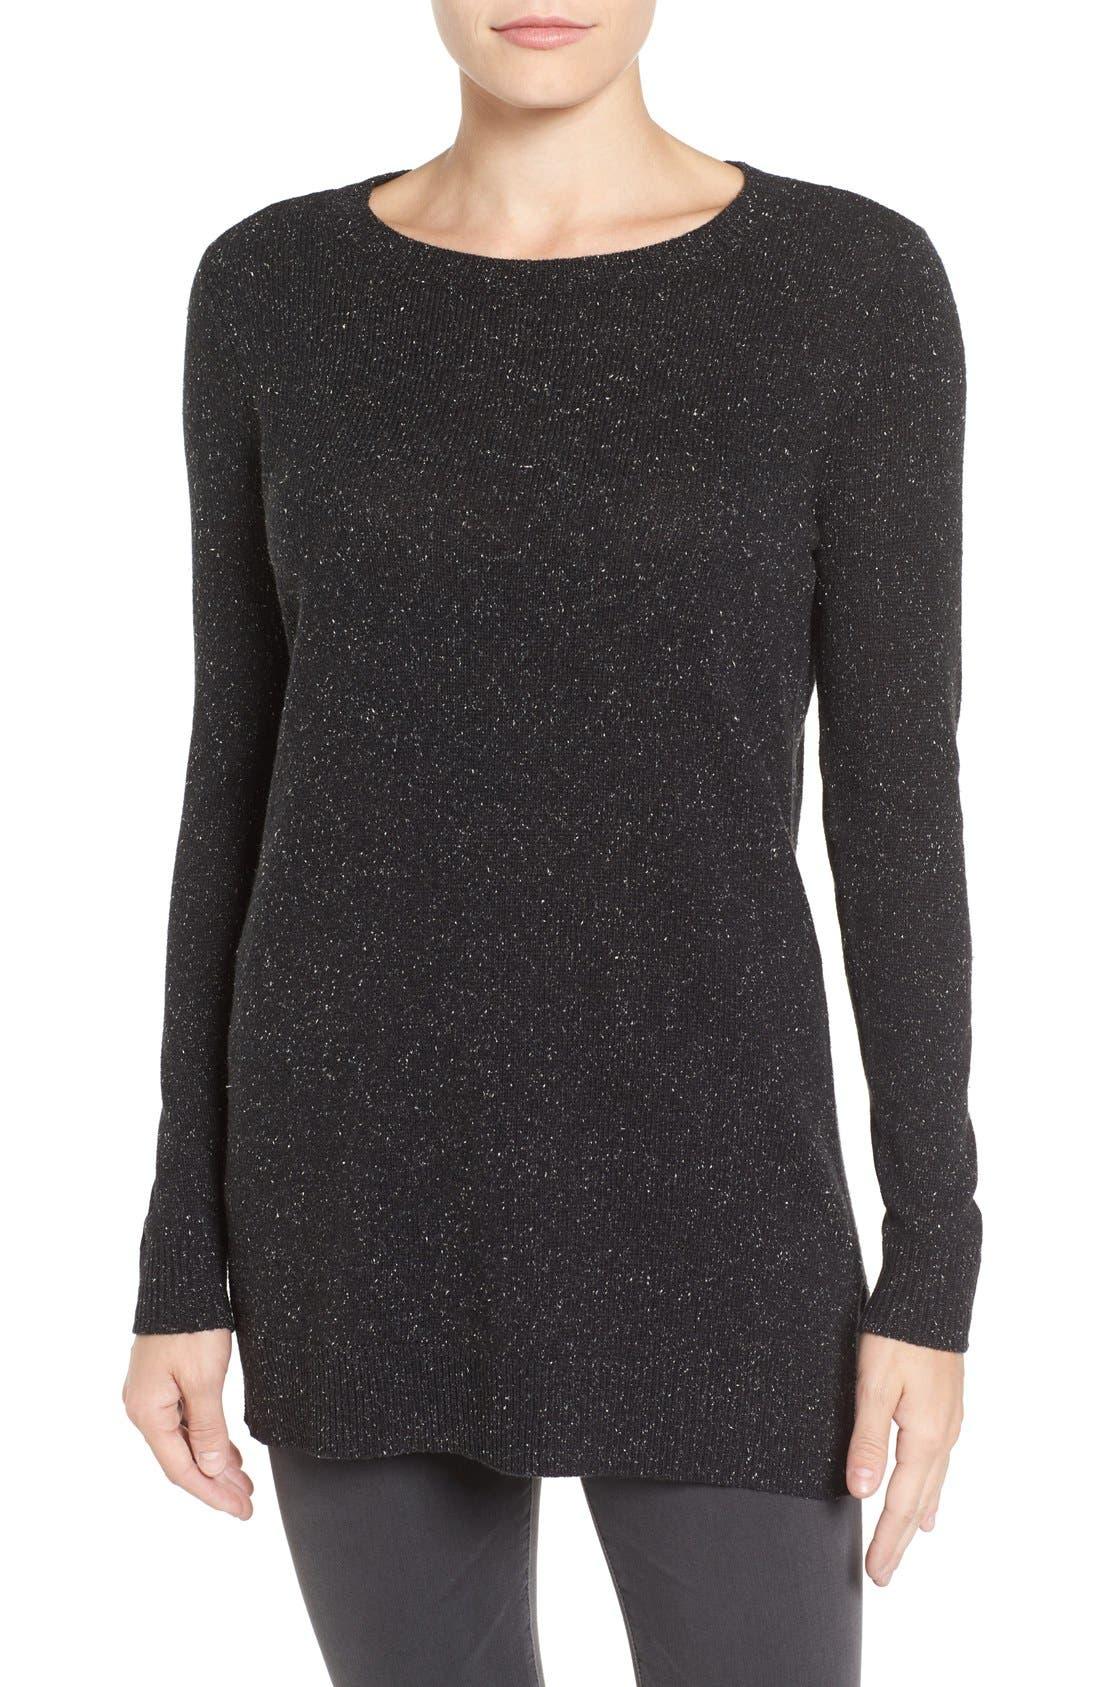 Alternate Image 1 Selected - Halogen® Rib Knit Tunic (Regular & Petite)